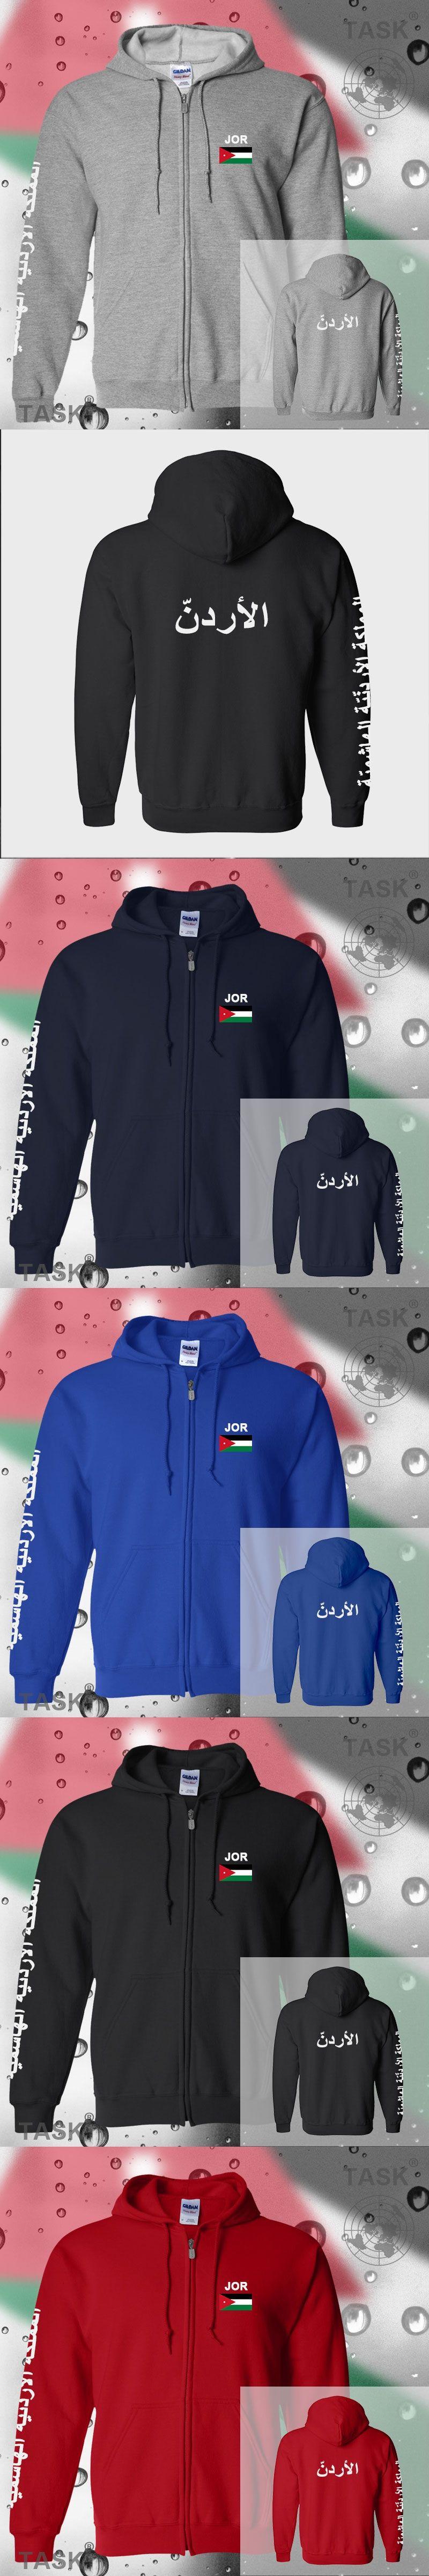 97dc6b645b6 The Hashemite Kingdom of Jordan Jordanian mens hoodies and sweatshirt  casual polo sweat new streetwear tracksuit